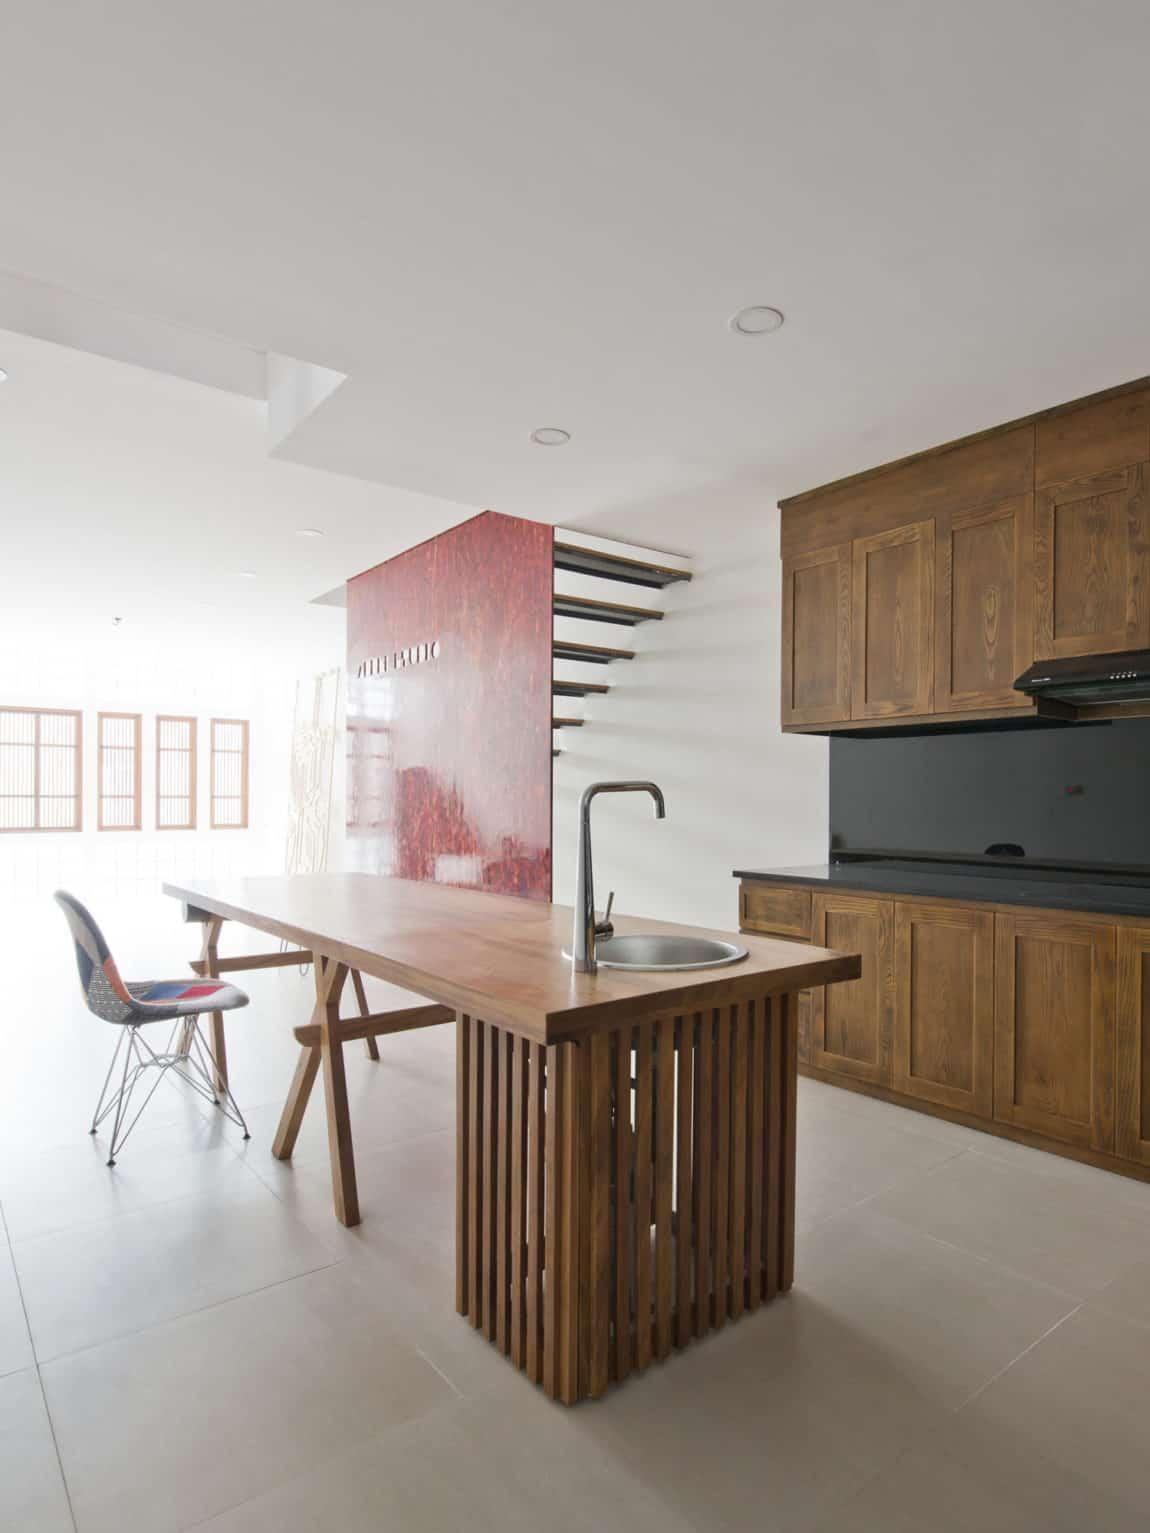 Narrow TT House in Hanoi by Adrei Studio Architecture (10)